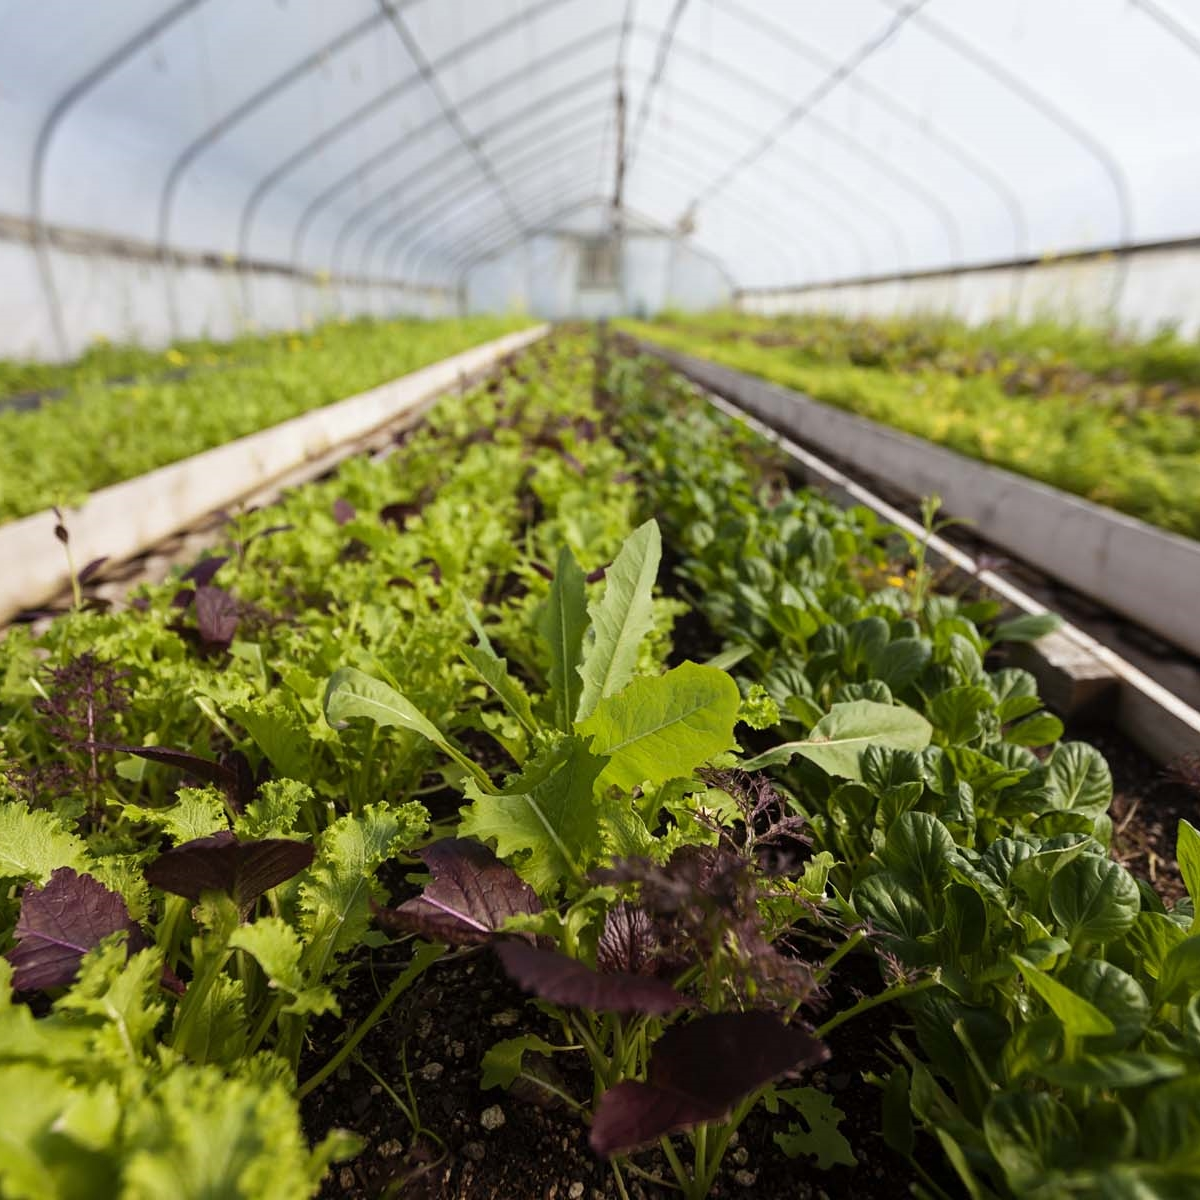 Fry Family Farm lettuce